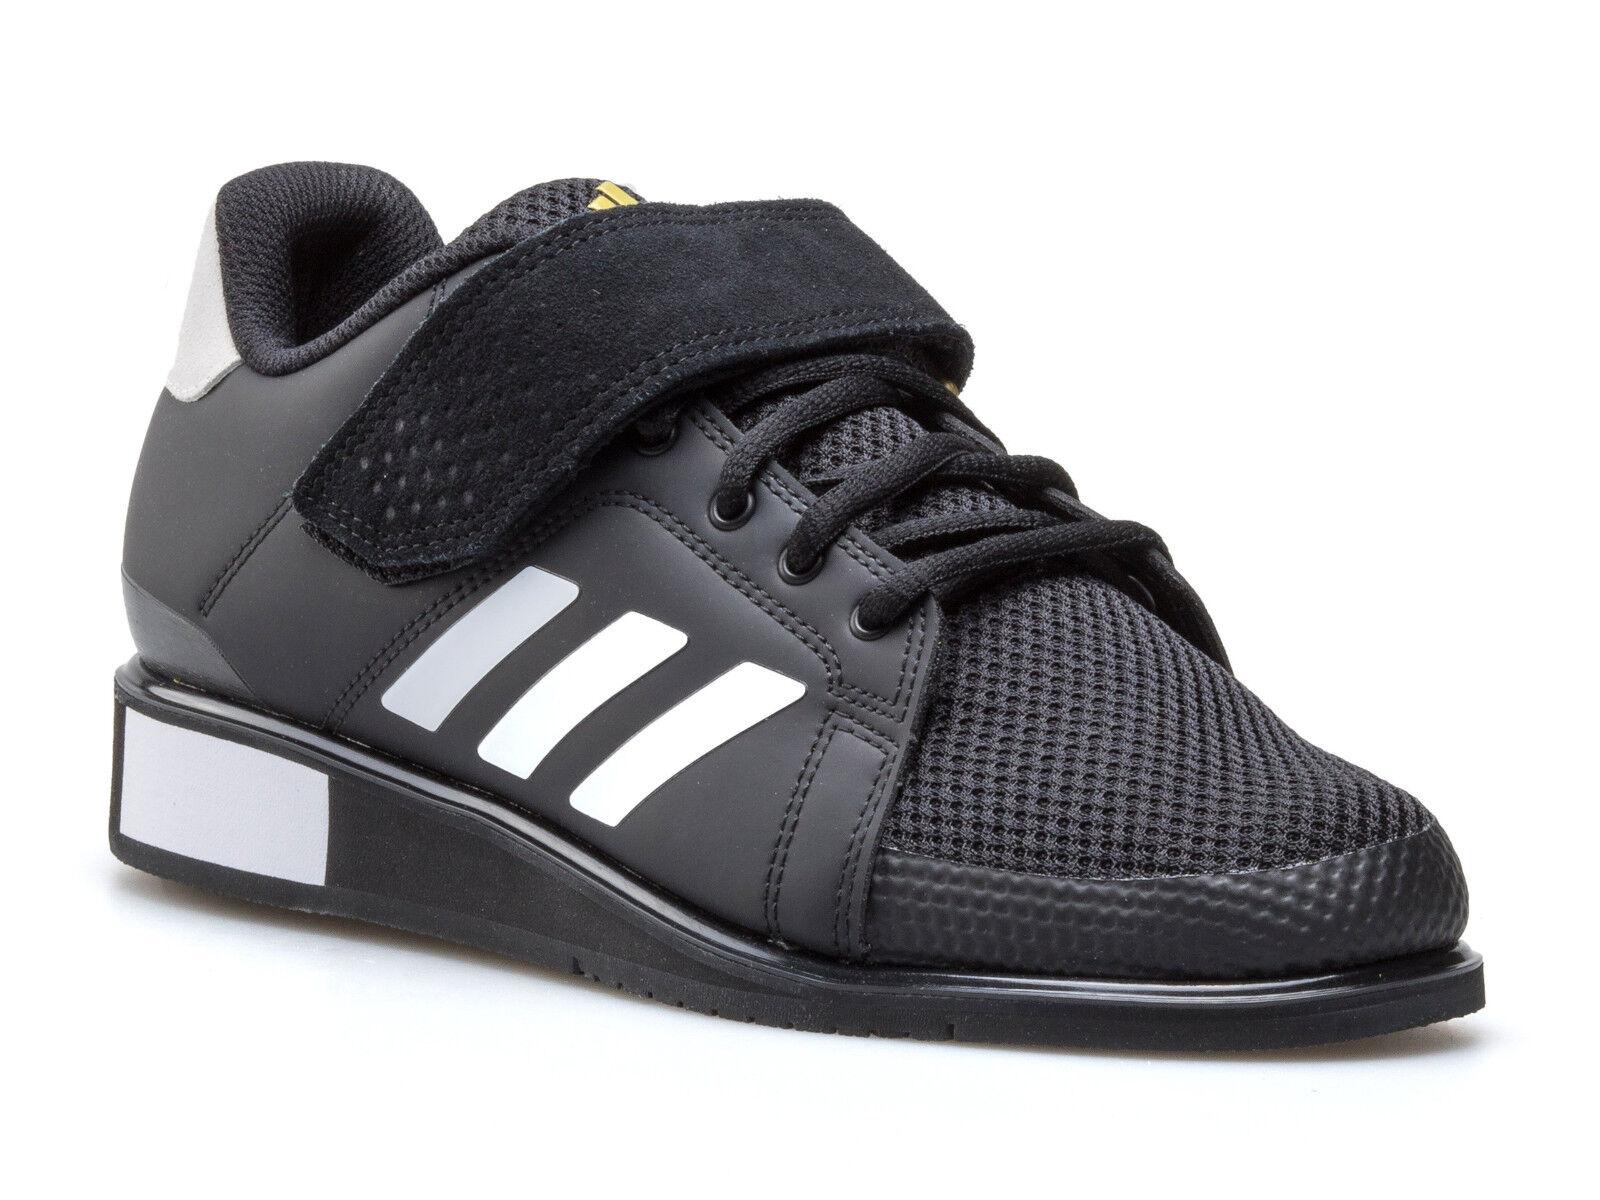 Adidas Zapatos de Halterofilia (Botas) potencia BB6363 Perfecto 3 para hombre BB6363 potencia gewichtheben 77eb42